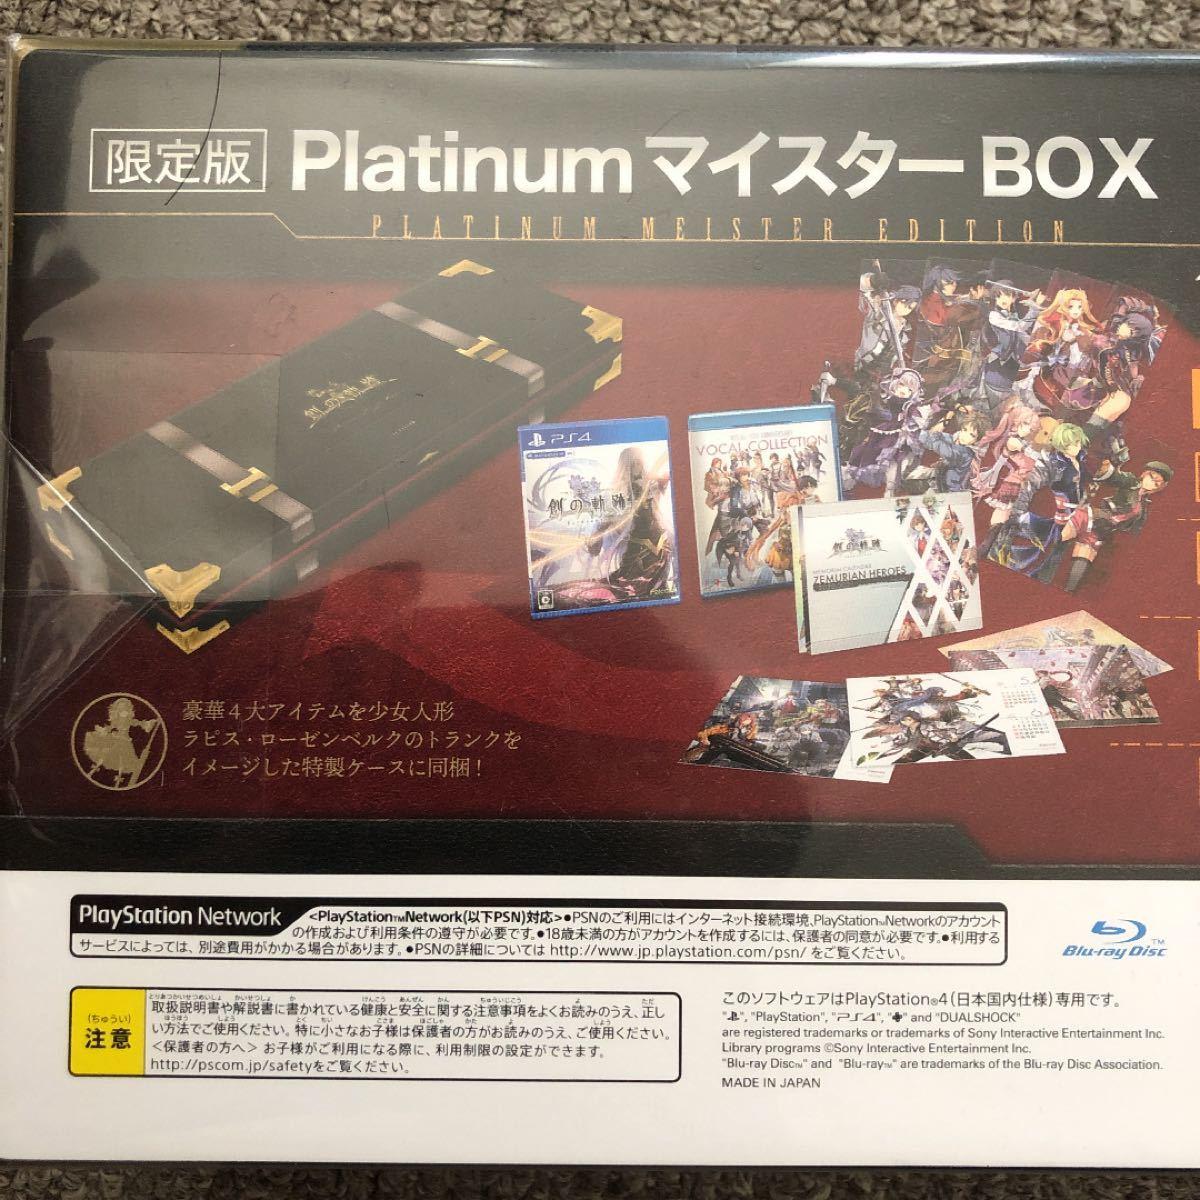 【PS4】 英雄伝説 創の軌跡 [PlatinumマイスターBOX] 初回特典付き 新品未開封